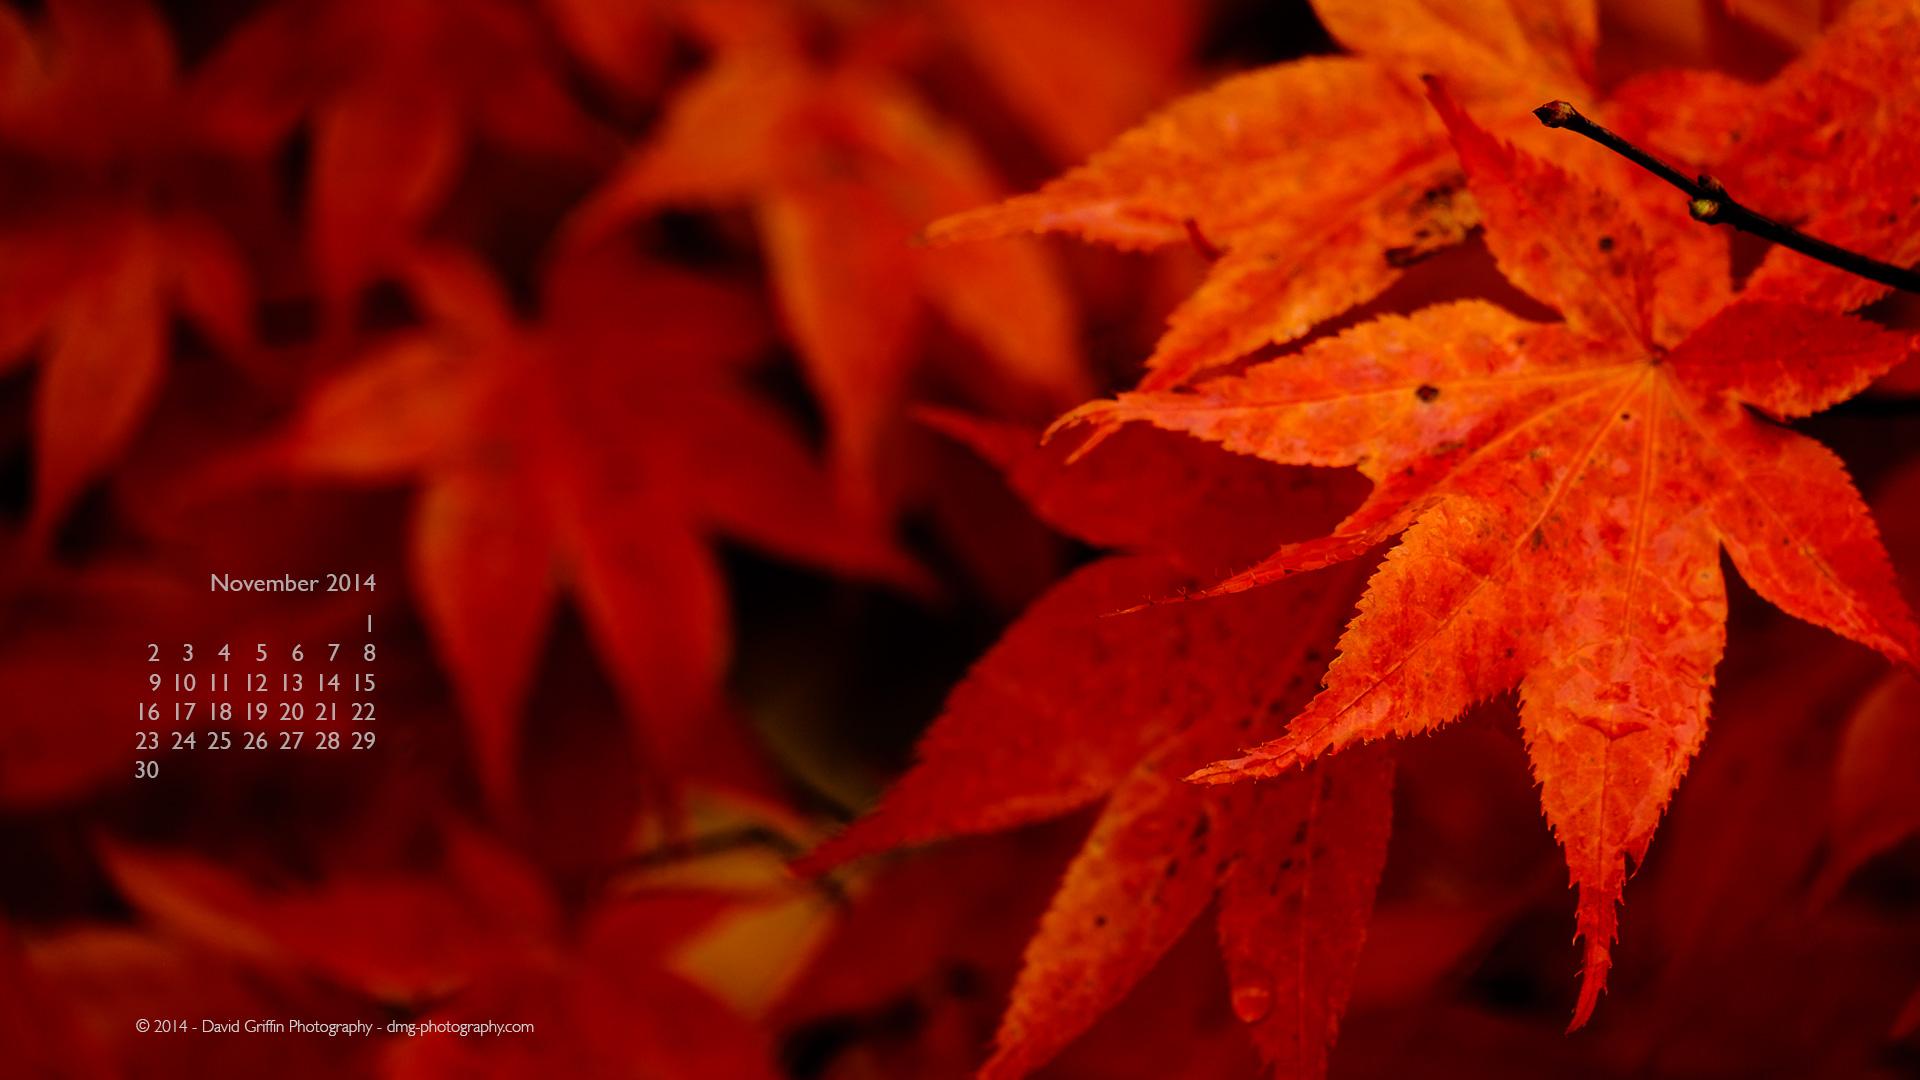 November 2014 Wallpaper David Griffin Photography 1920x1080